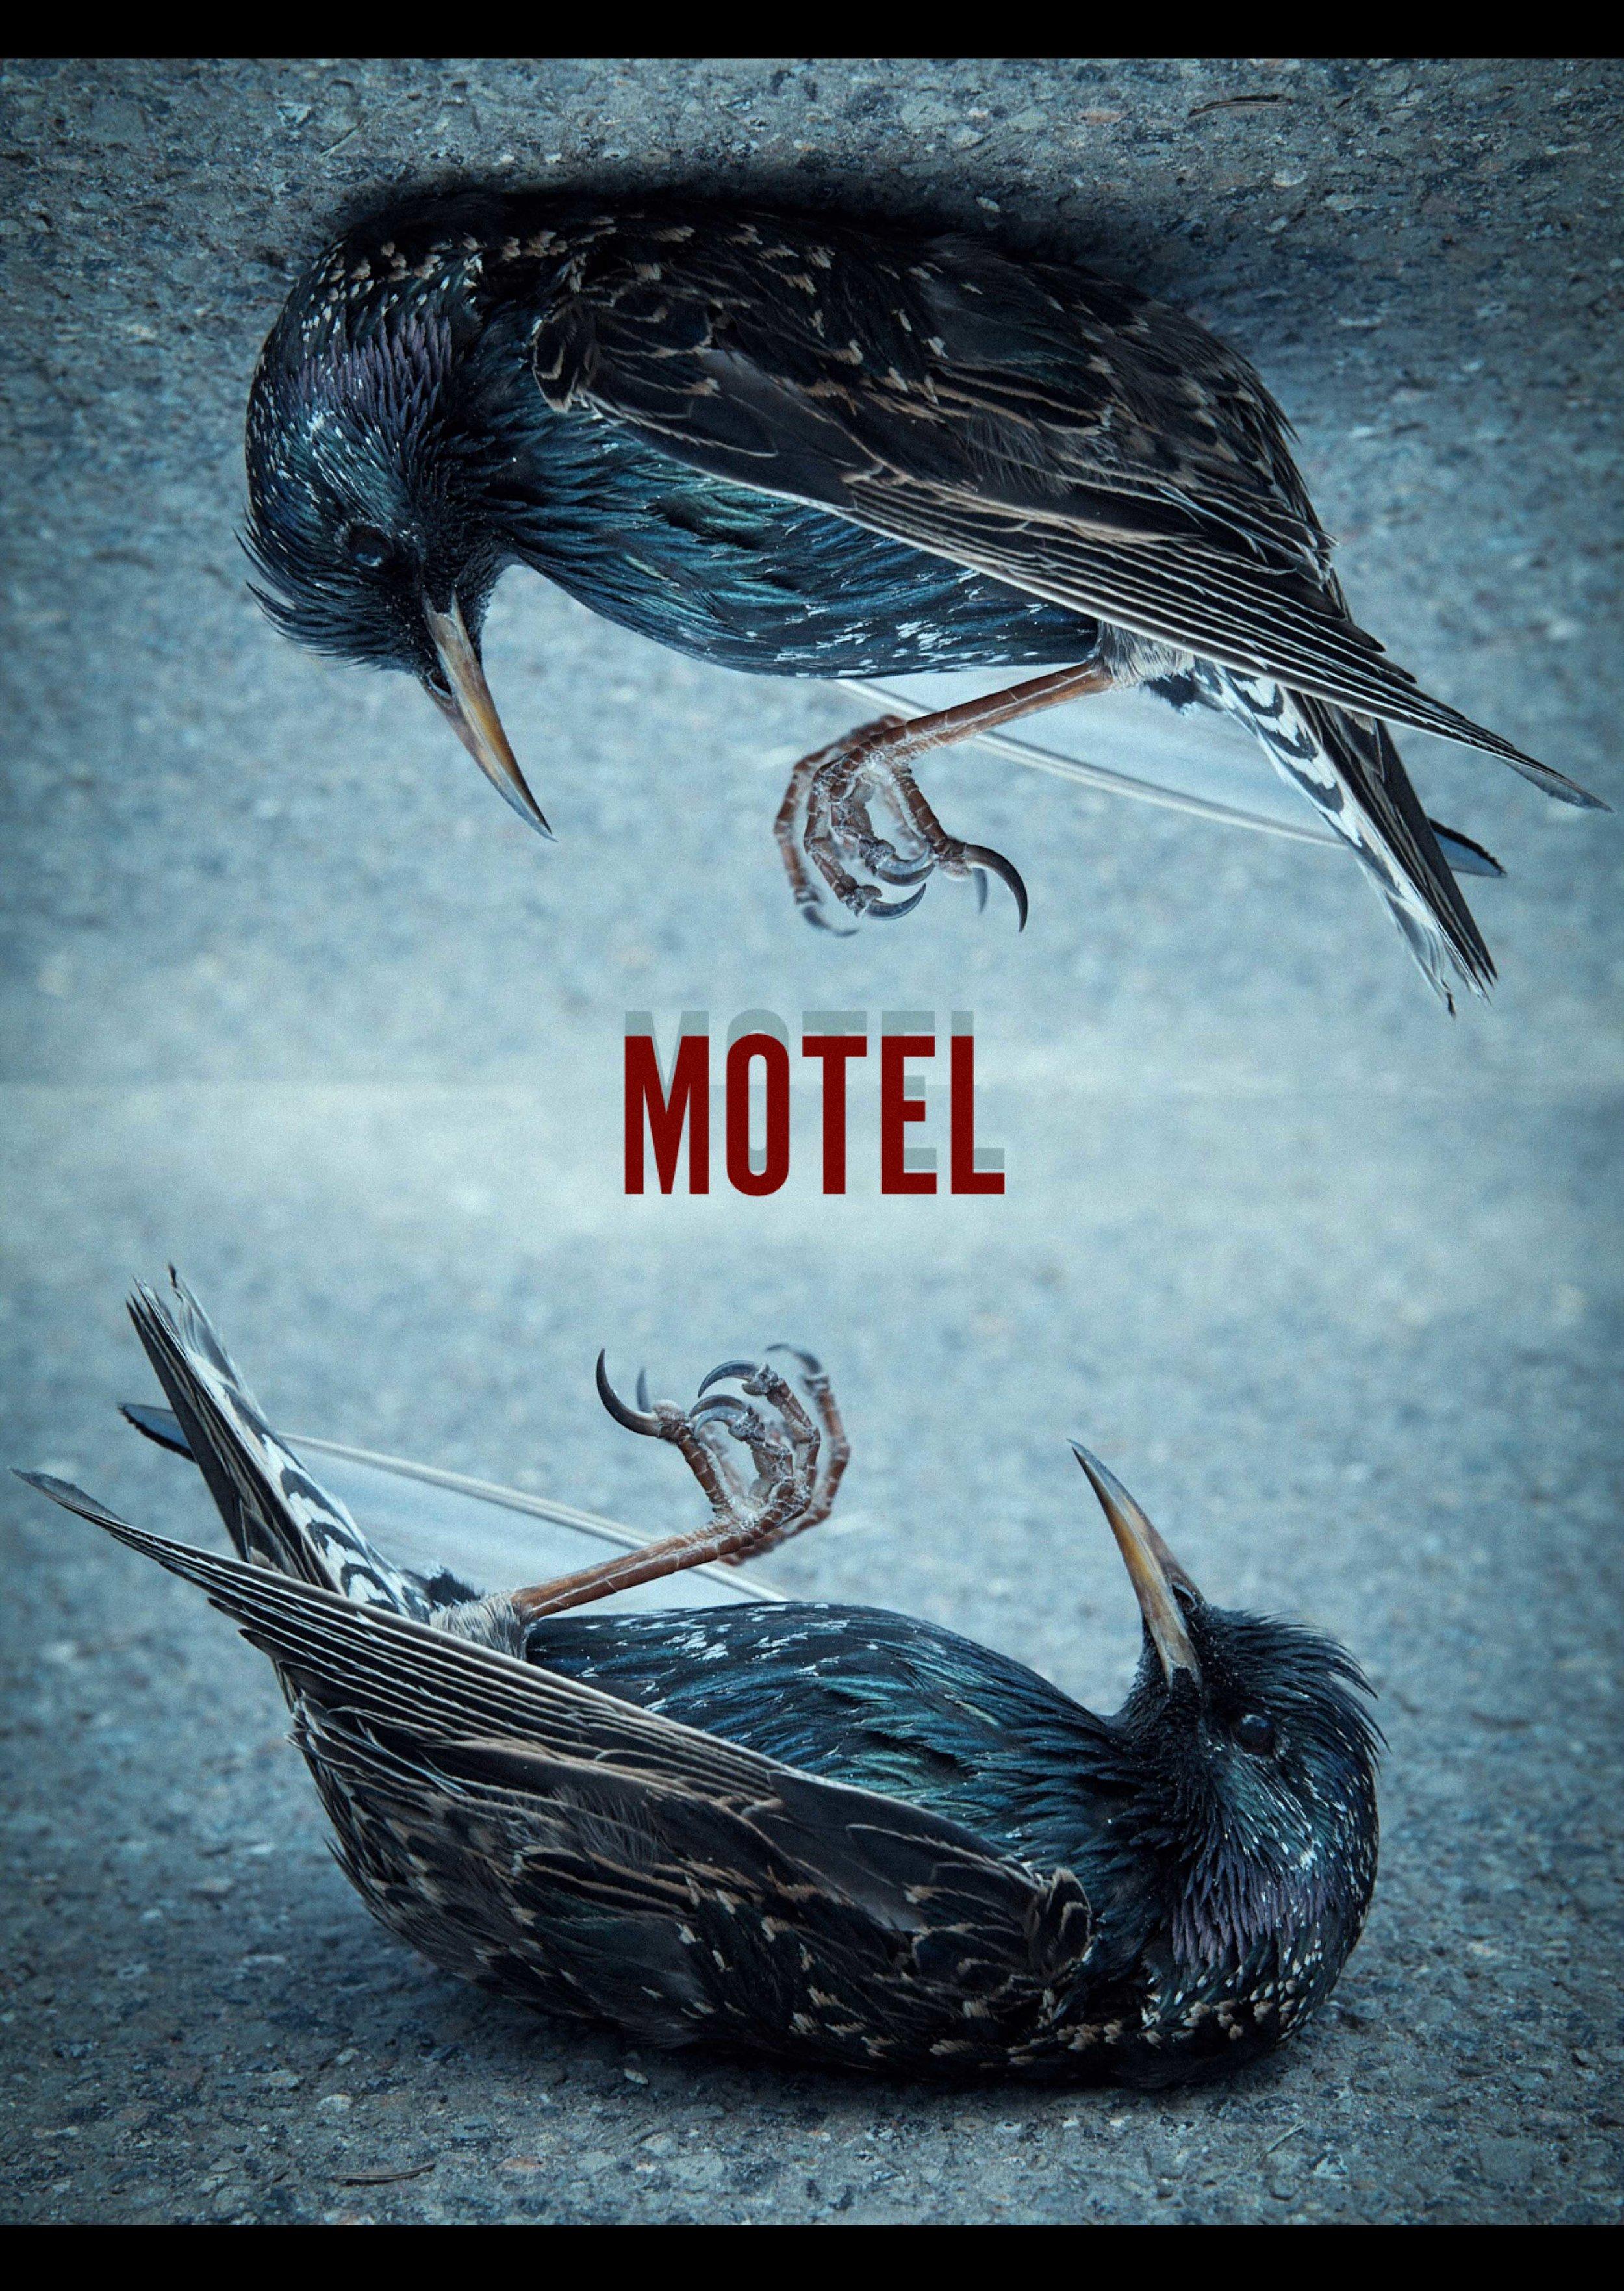 MOTEL_poster_9 copy_Web.jpg